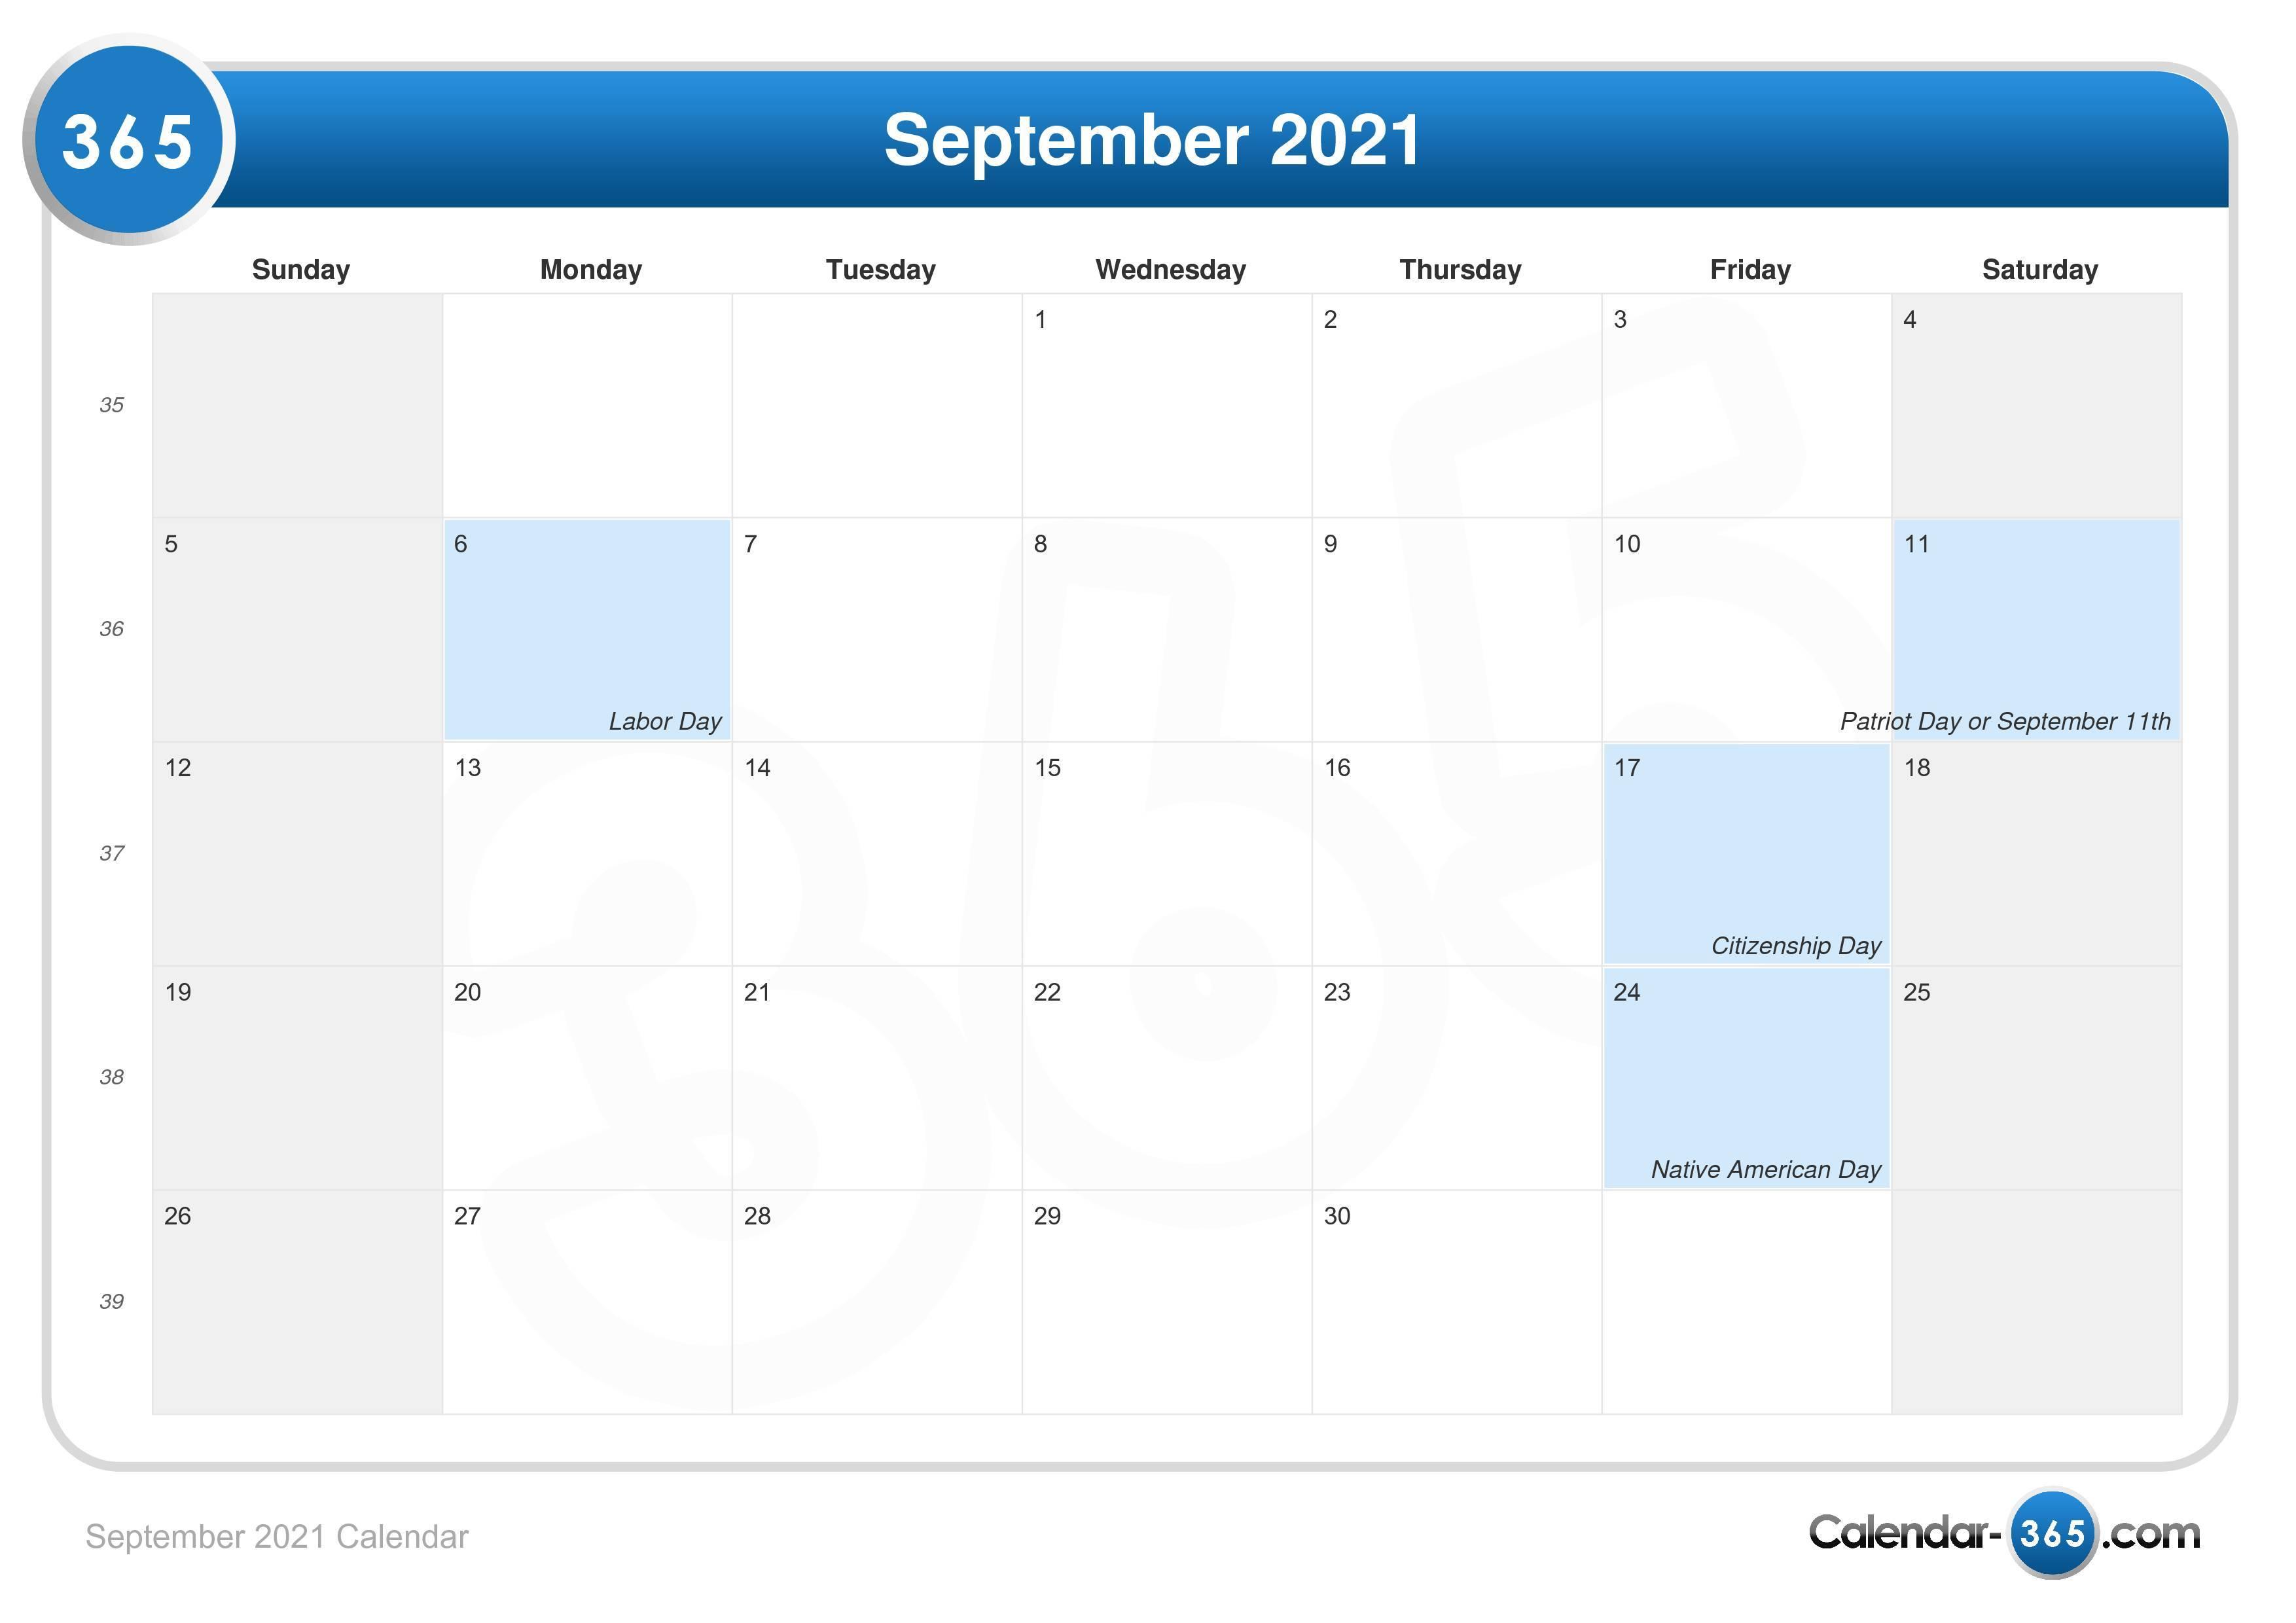 2021 Labor Day Calendar September 2021 Calendar